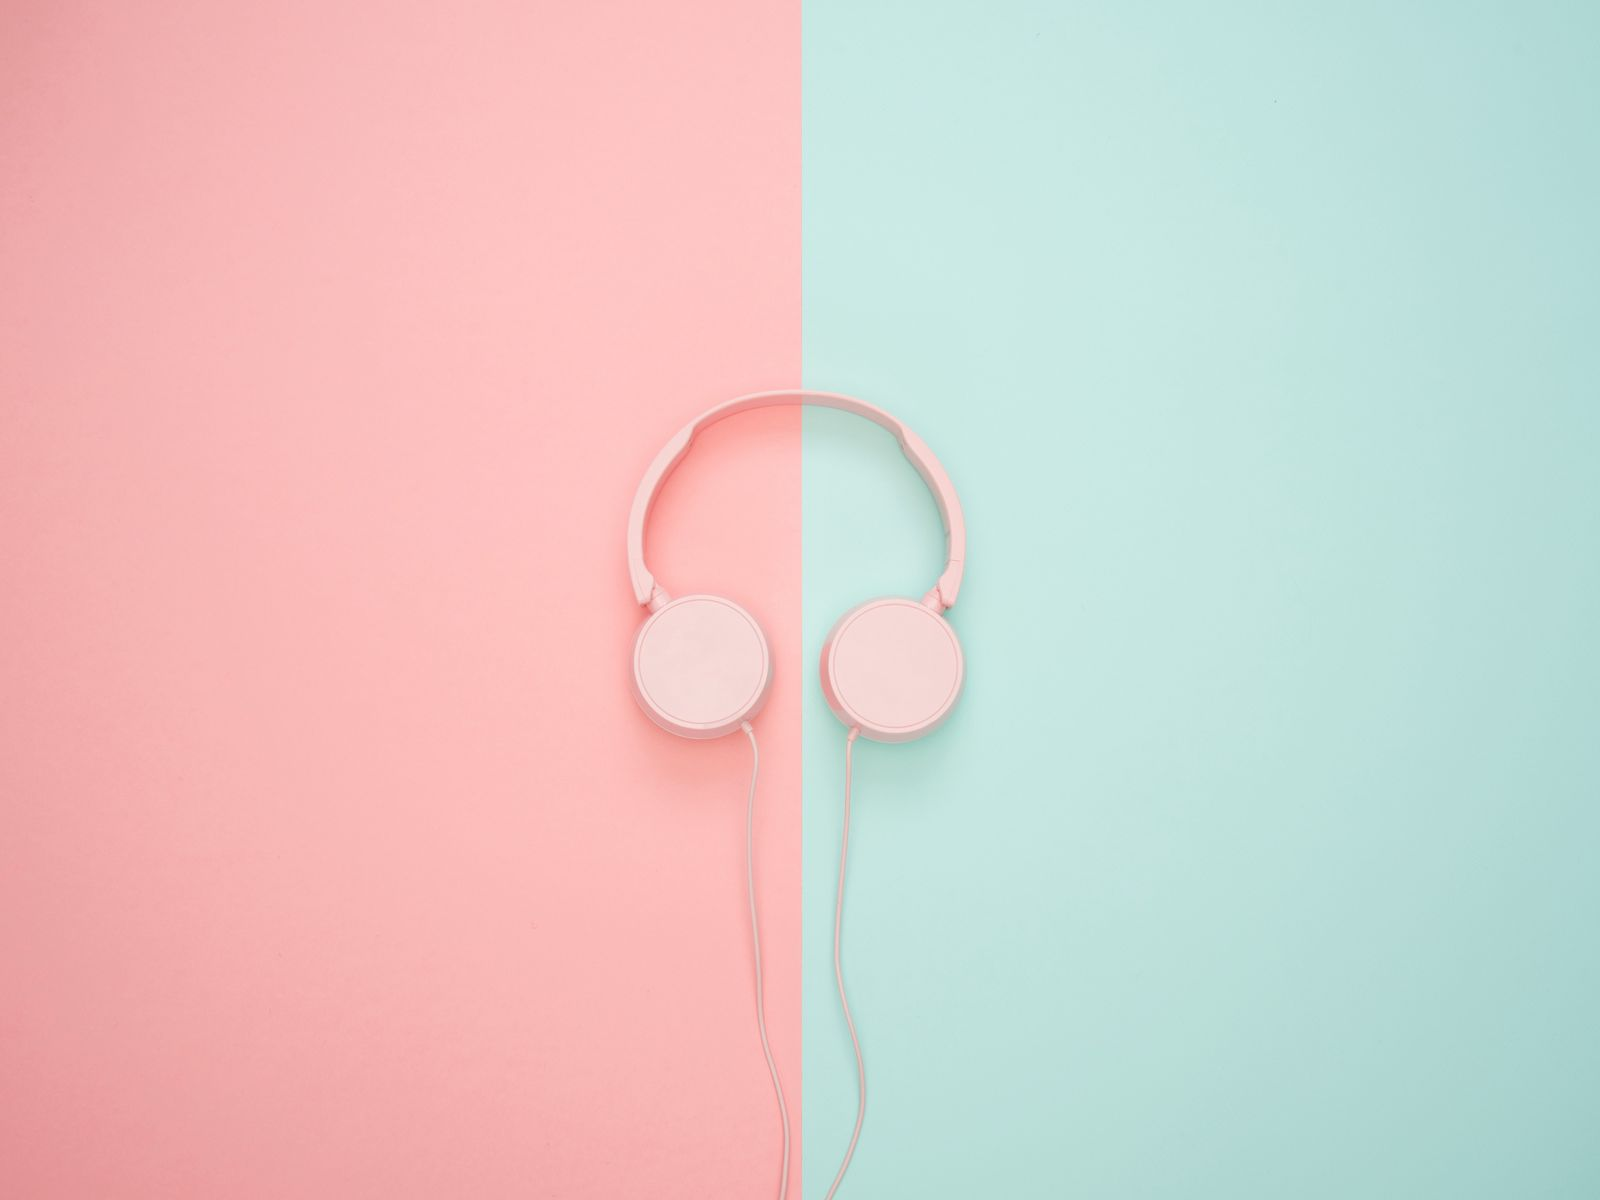 1600x1200 Wallpaper headphones, minimalism, pink, pastel